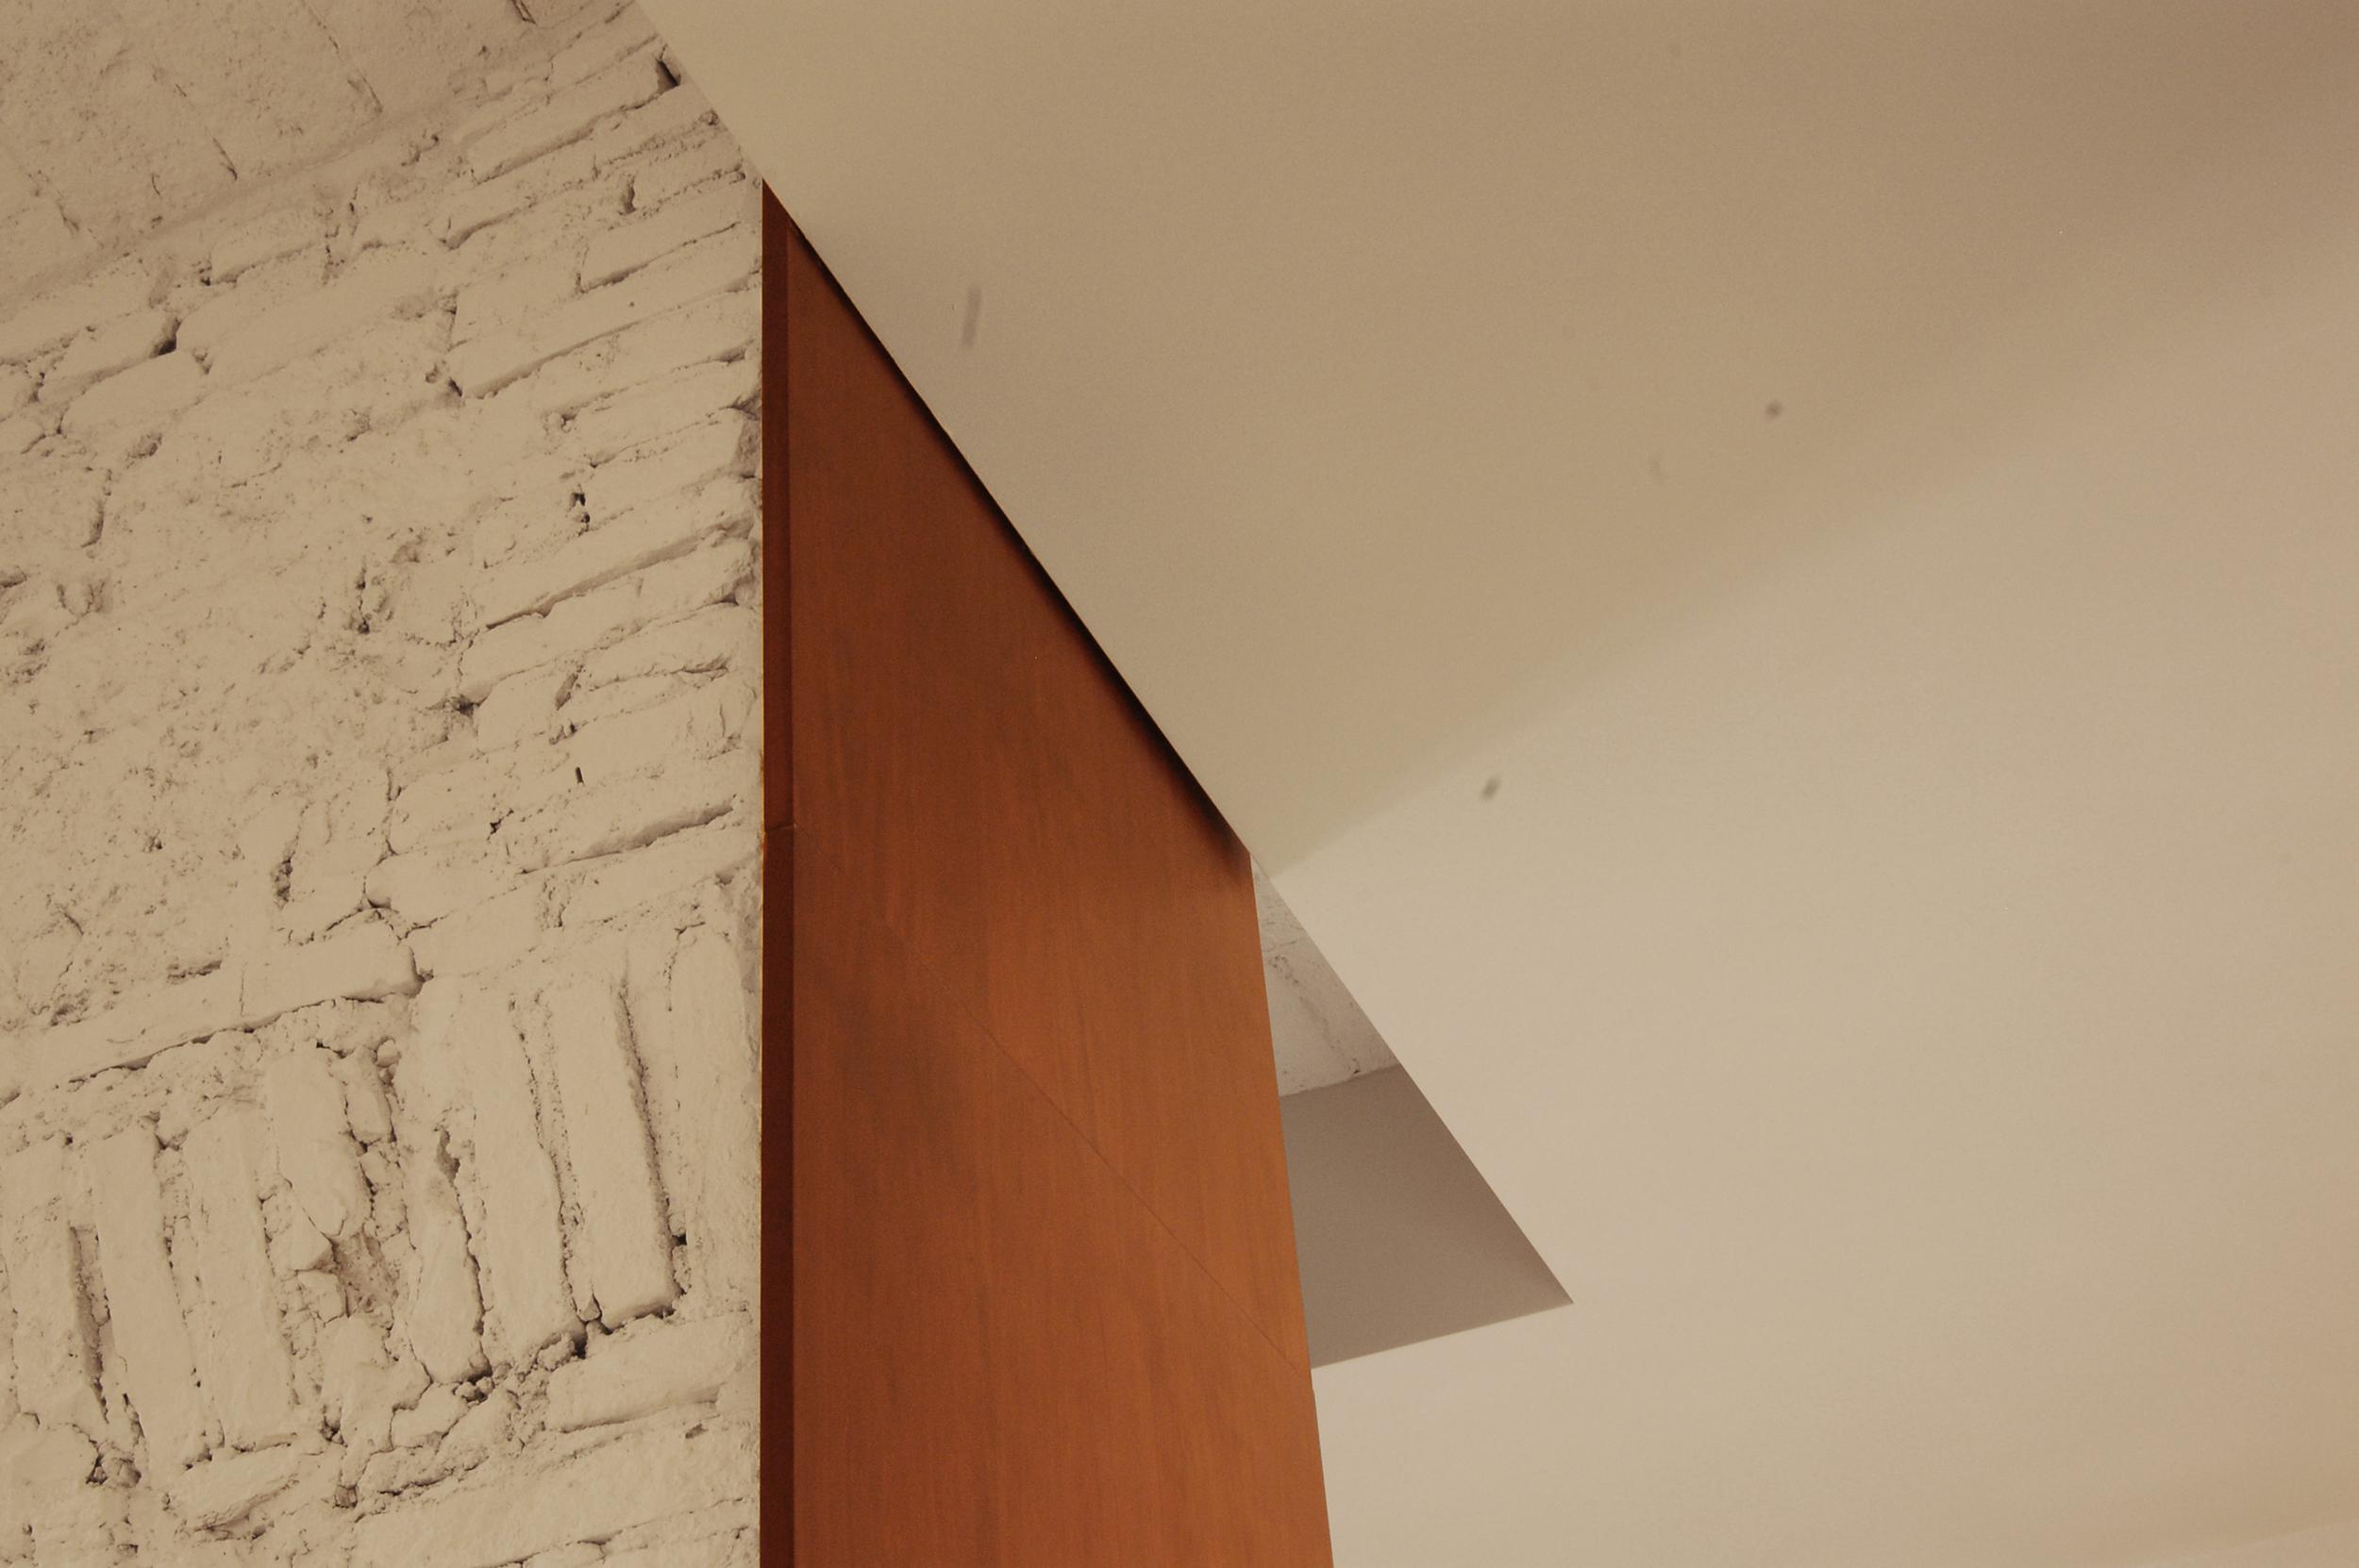 Immagine di dettaglio: geometrie rigorose e materiali caldi per una eleganza discreta.